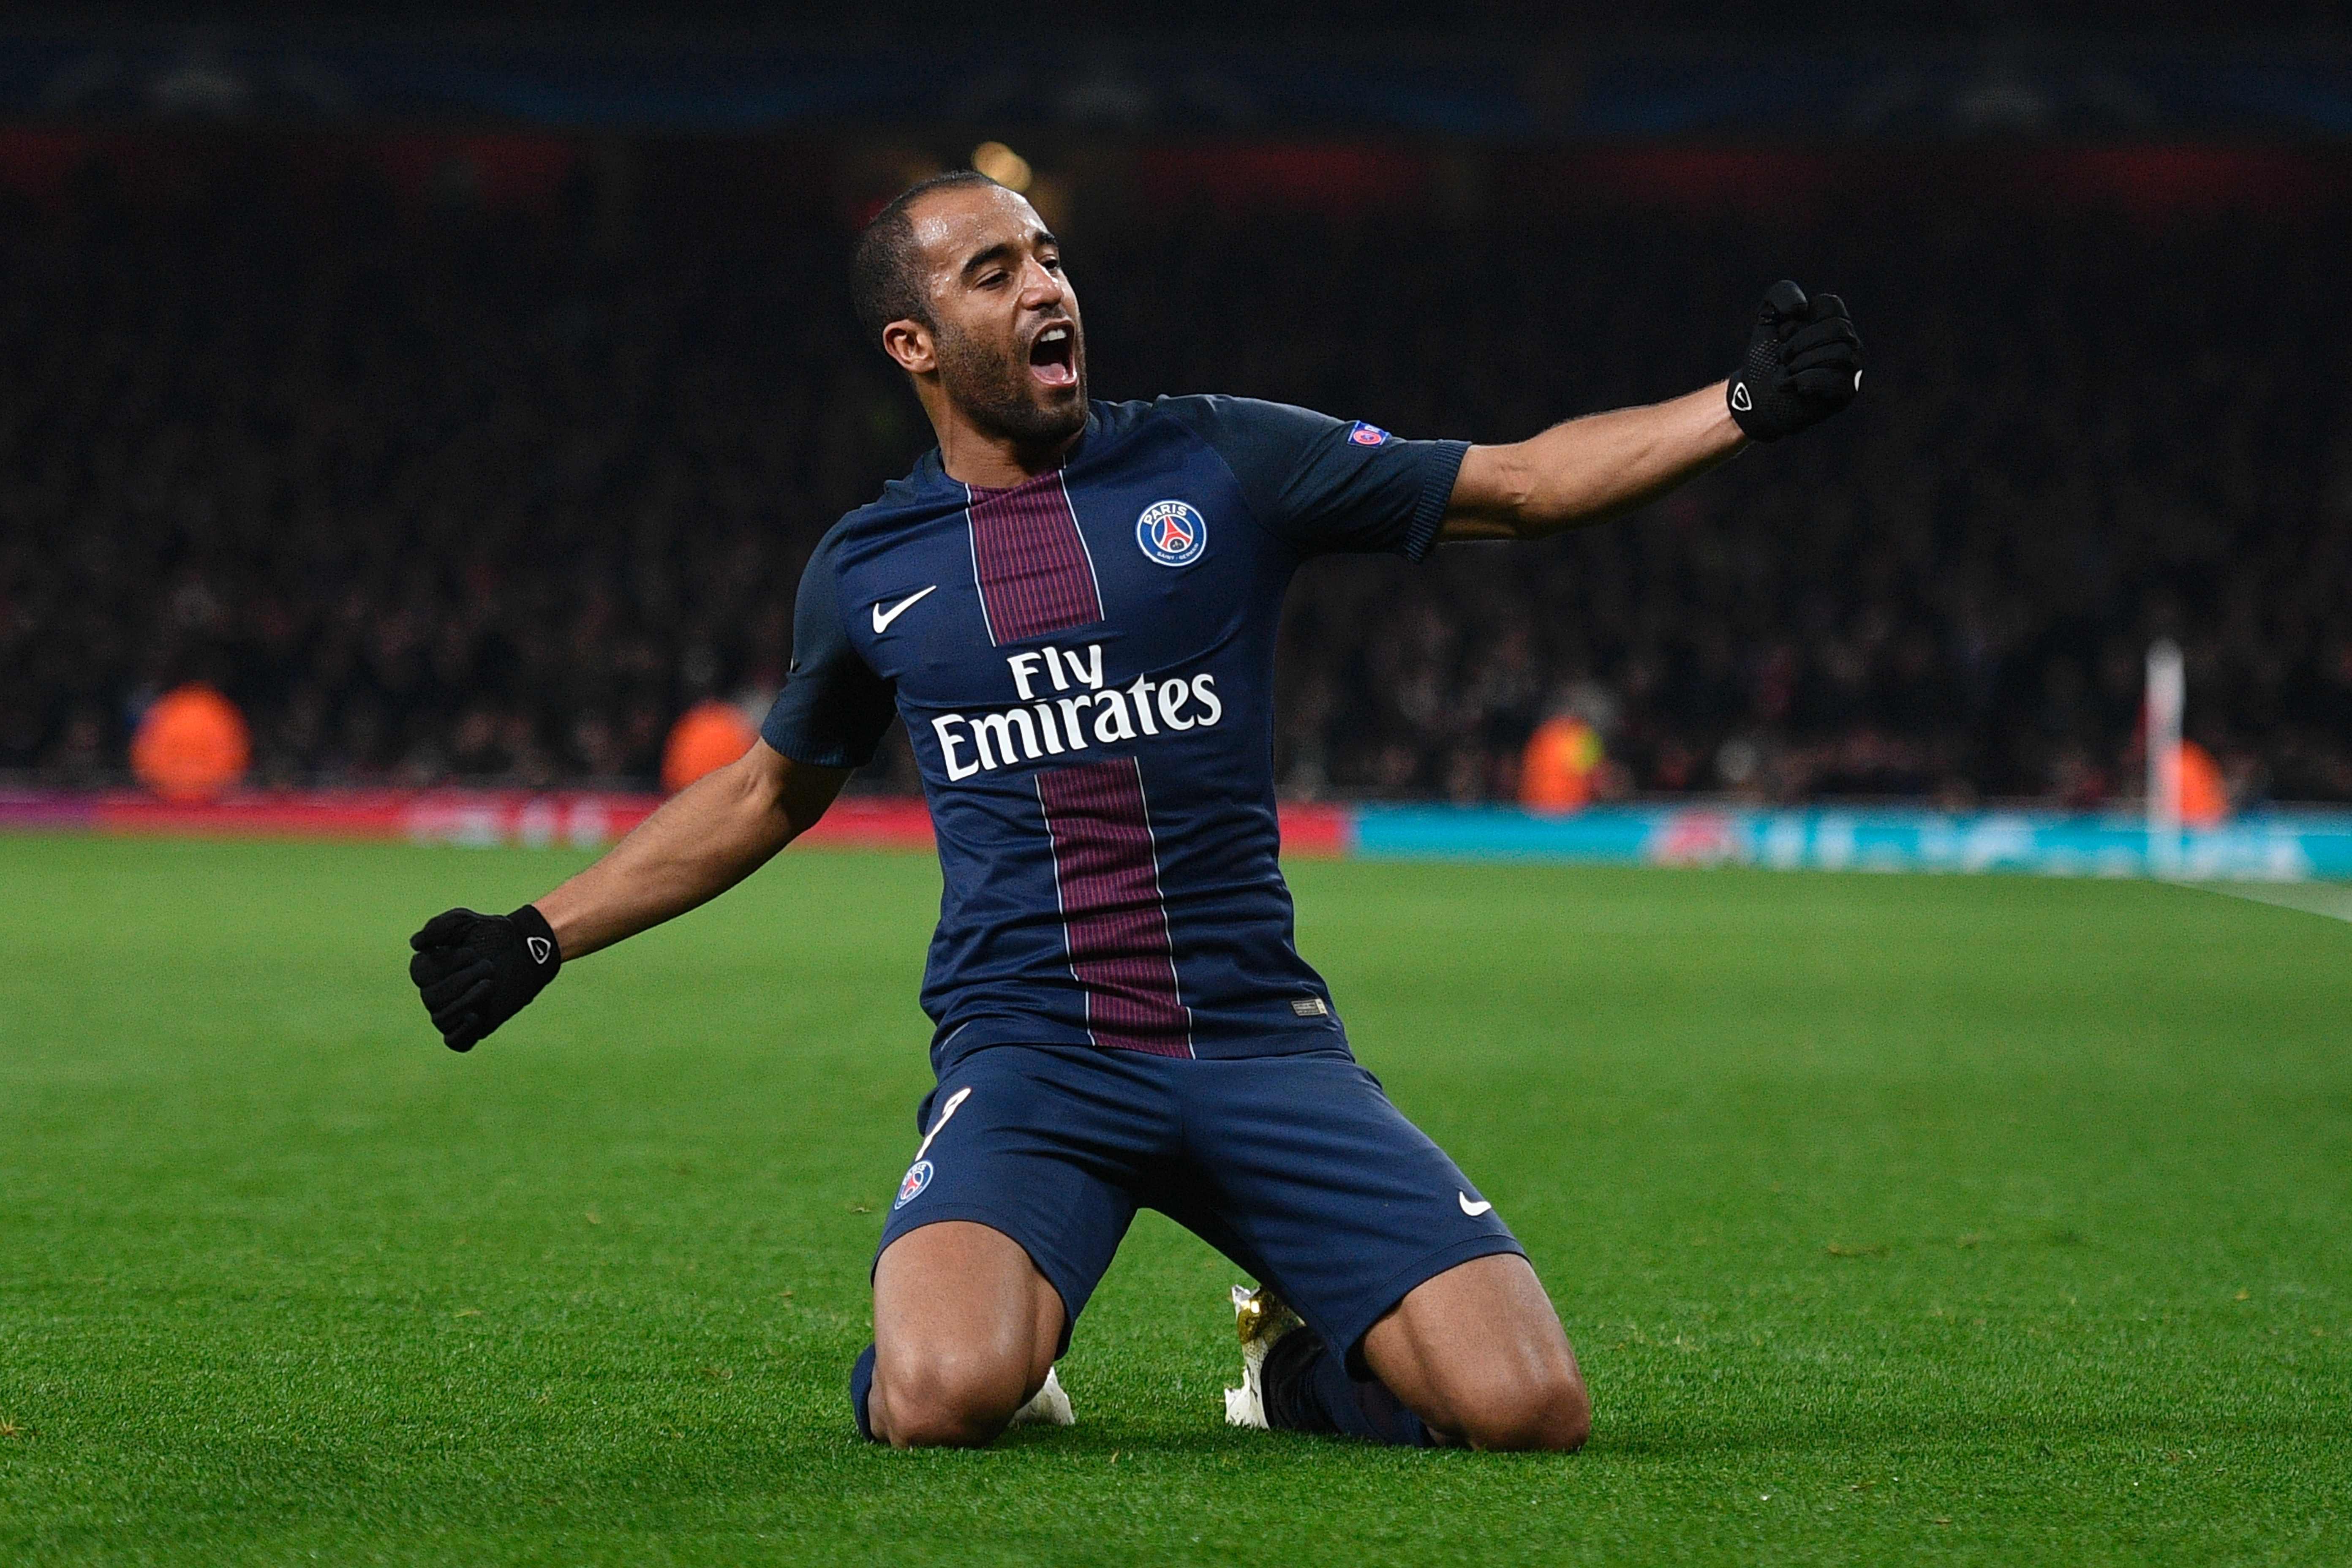 Moura has played 212 times for Paris Saint-Germain